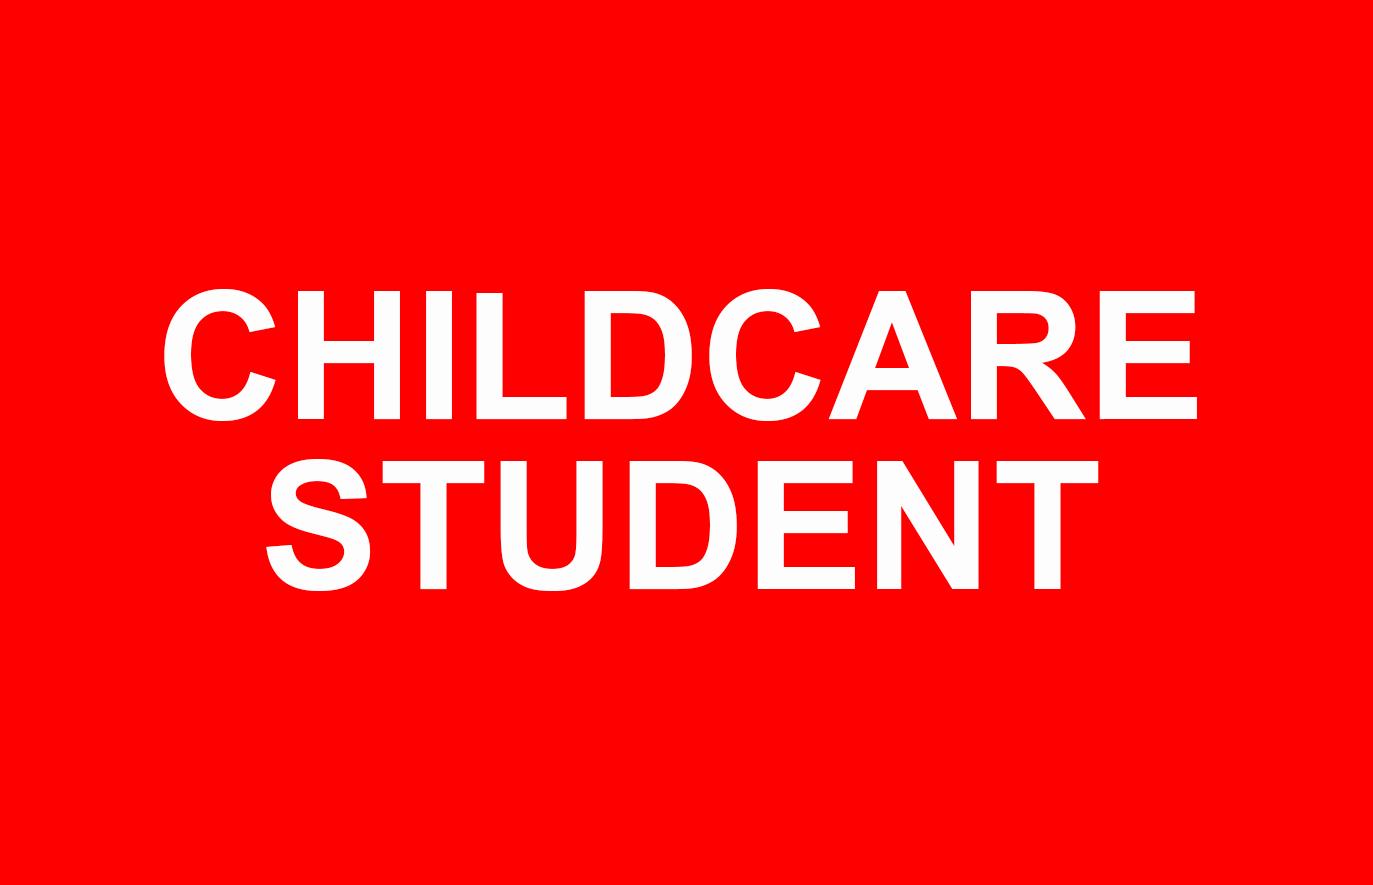 runshaw-childcare-student.png